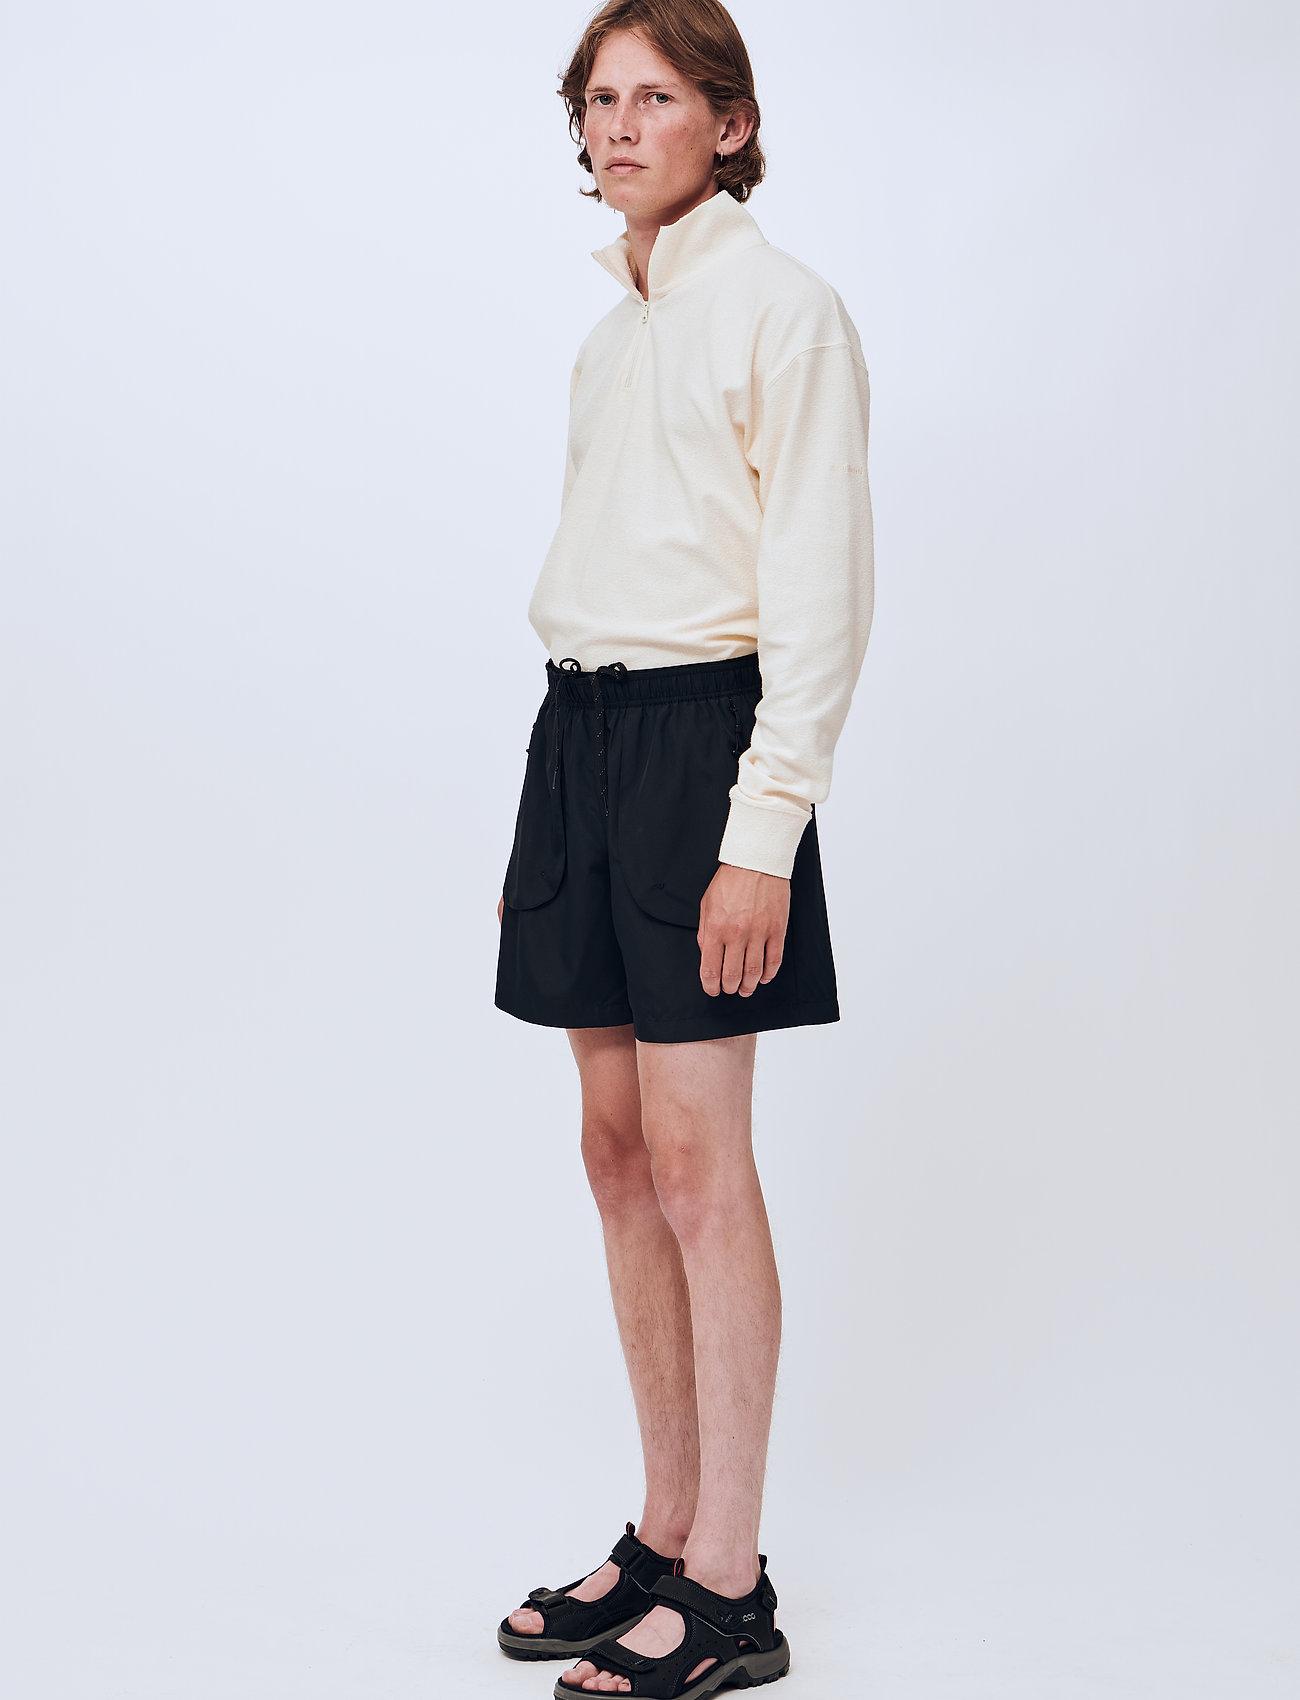 Soulland - Harley shorts - krótkie spodenki - black - 0